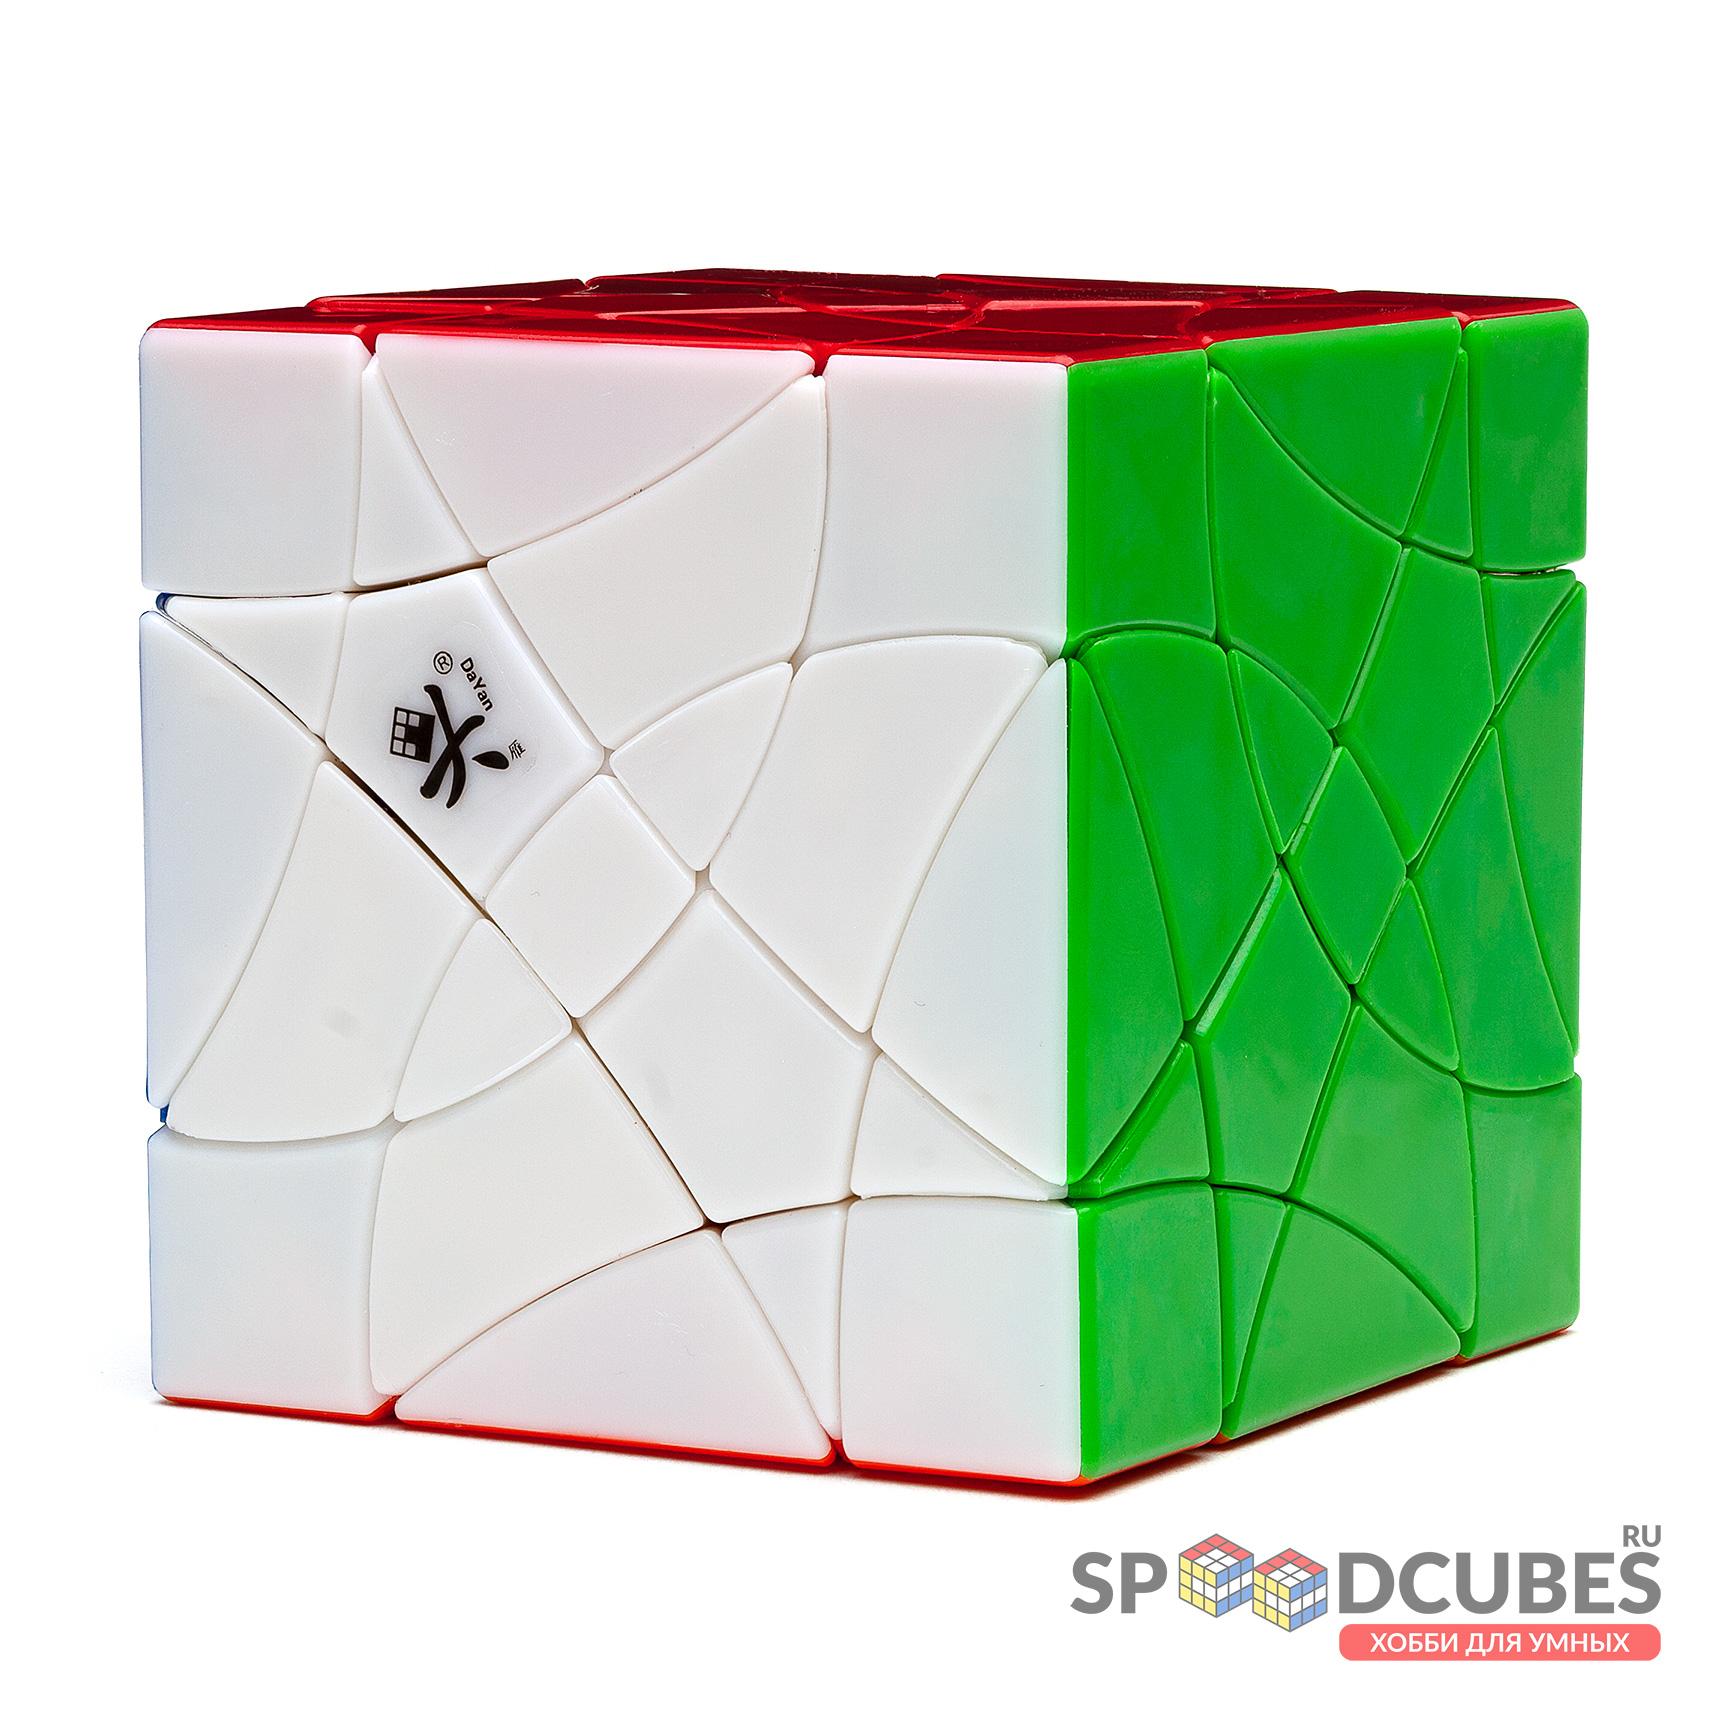 DaYan ShuangFeiyan Cube (16 Axis)